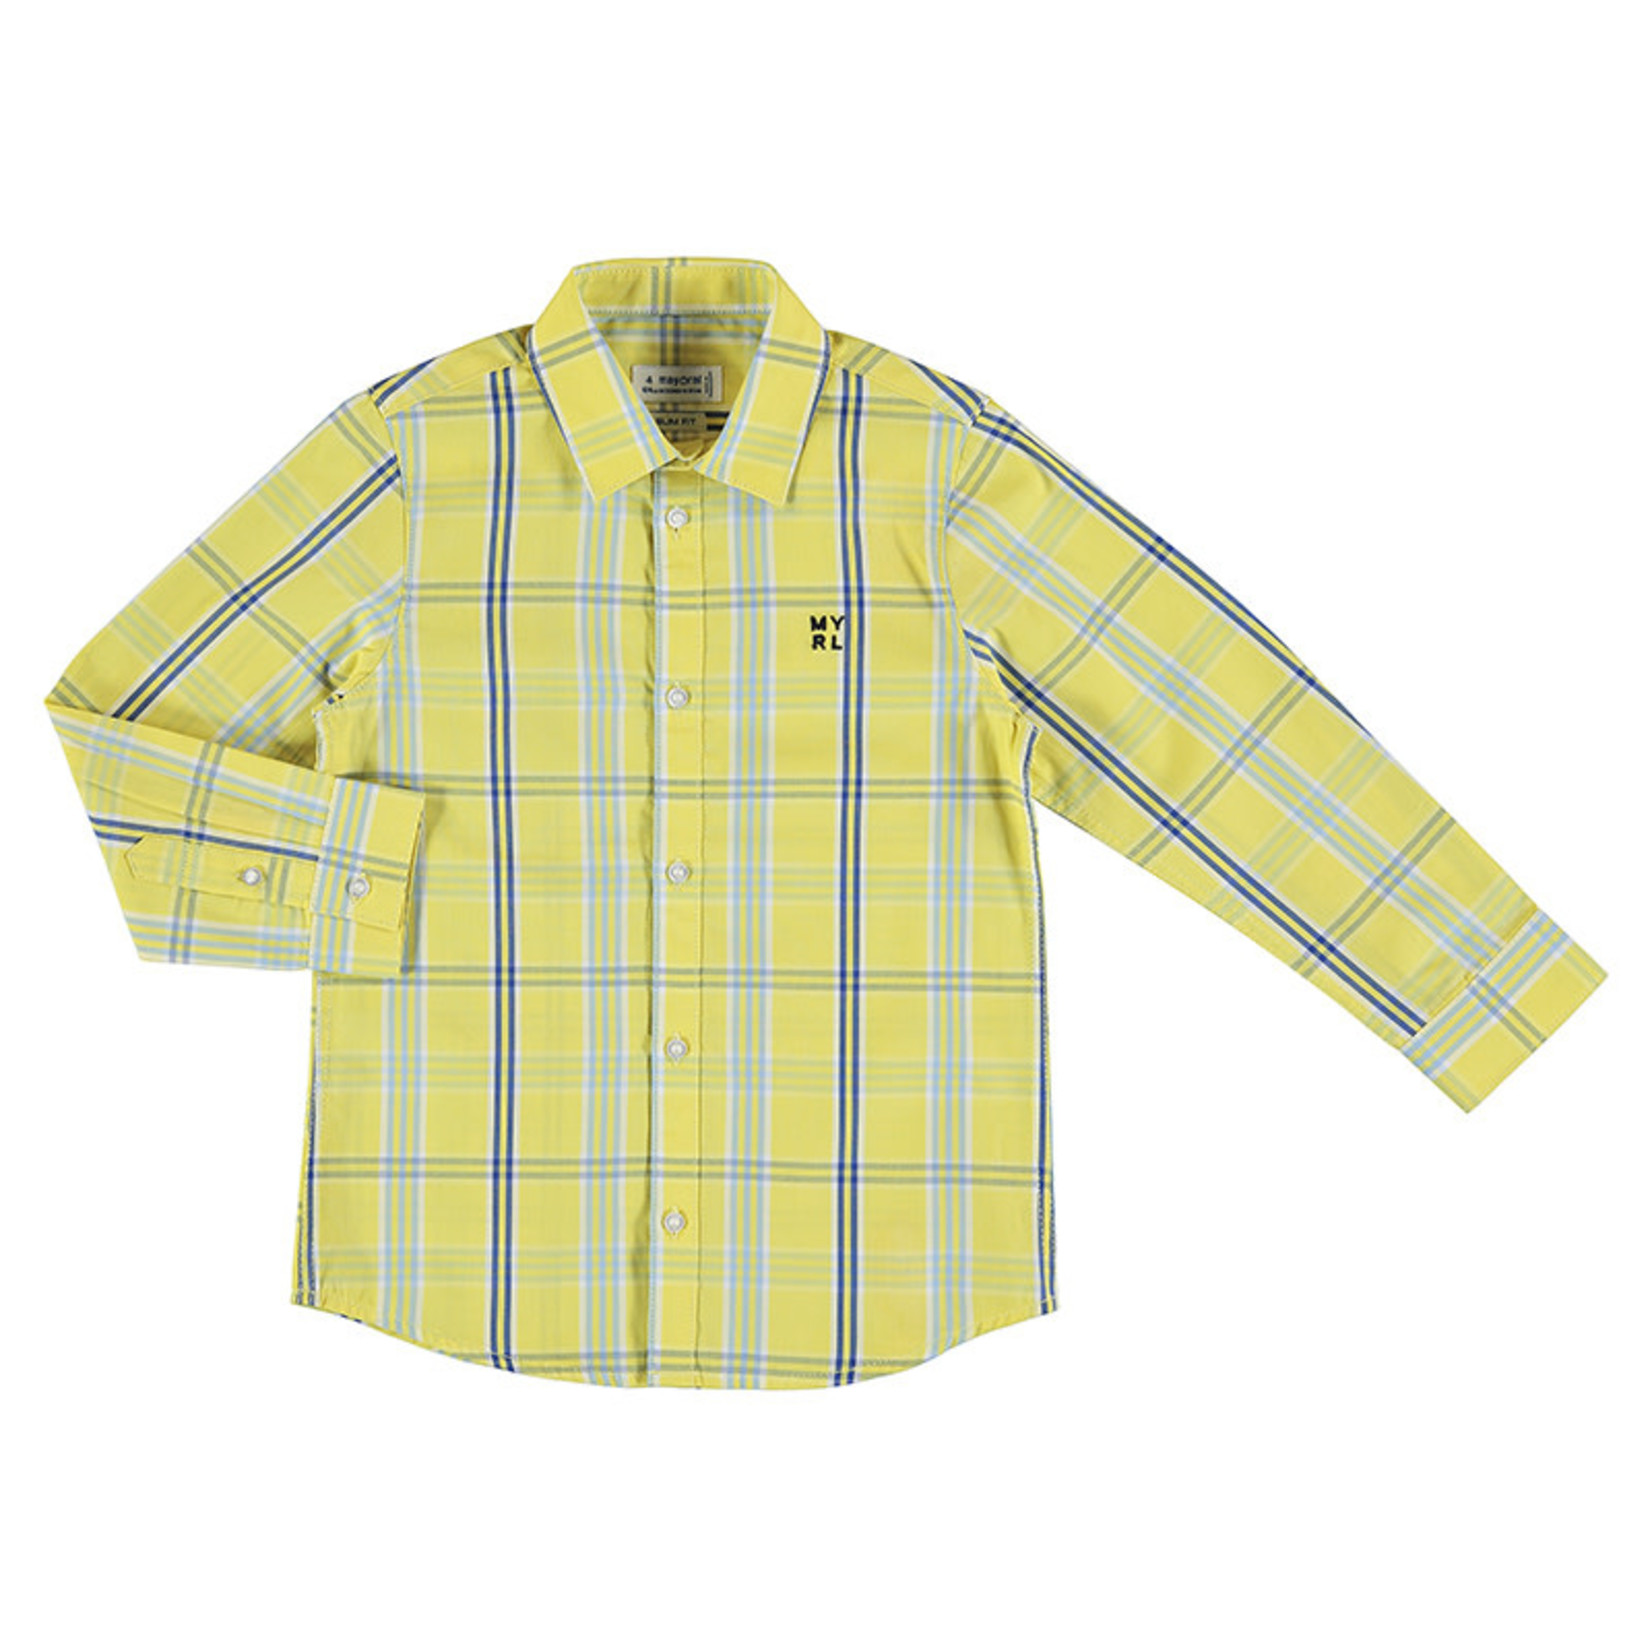 Mayoral Boys Long Sleeved Yellow Plaid Shirt